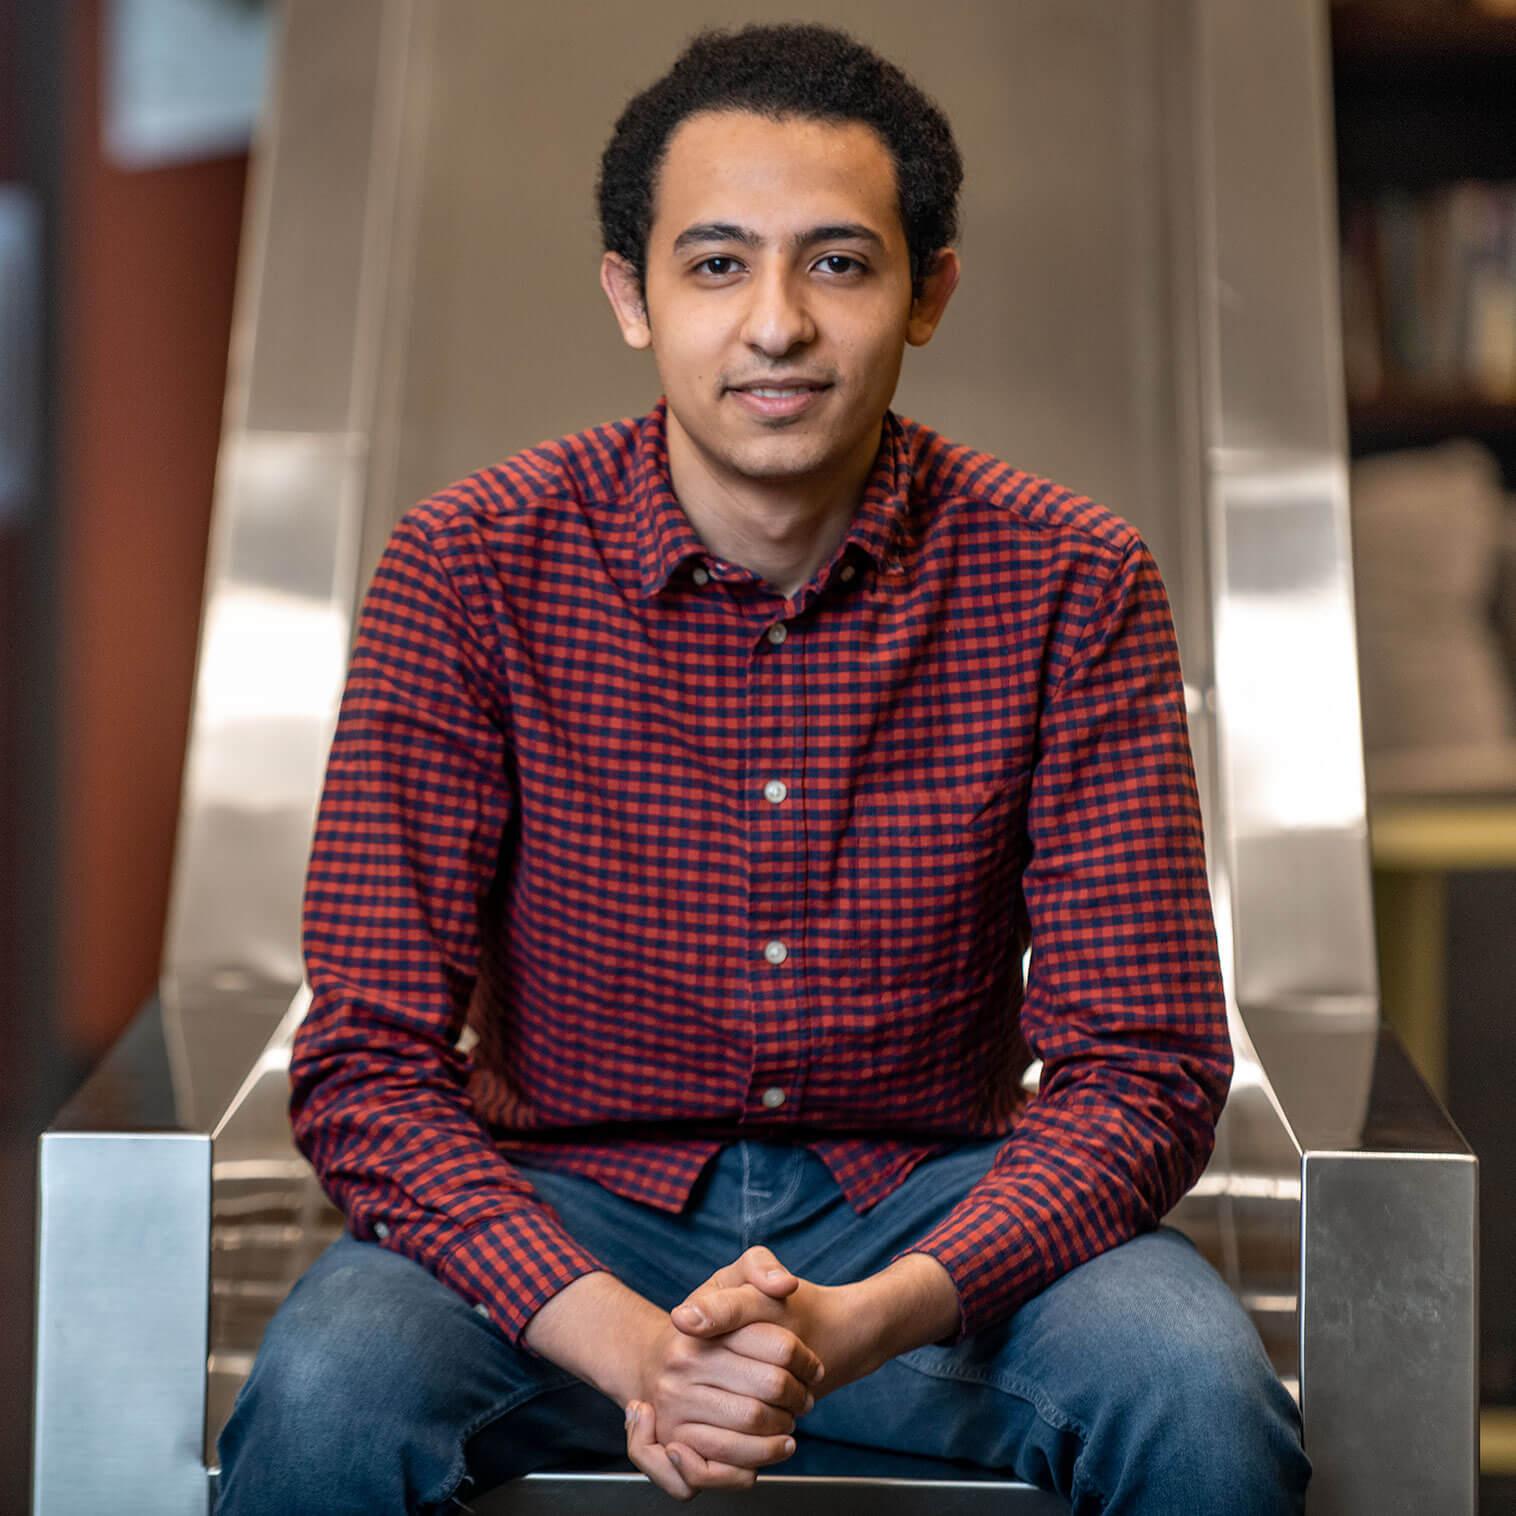 Hassan Abdelsamad